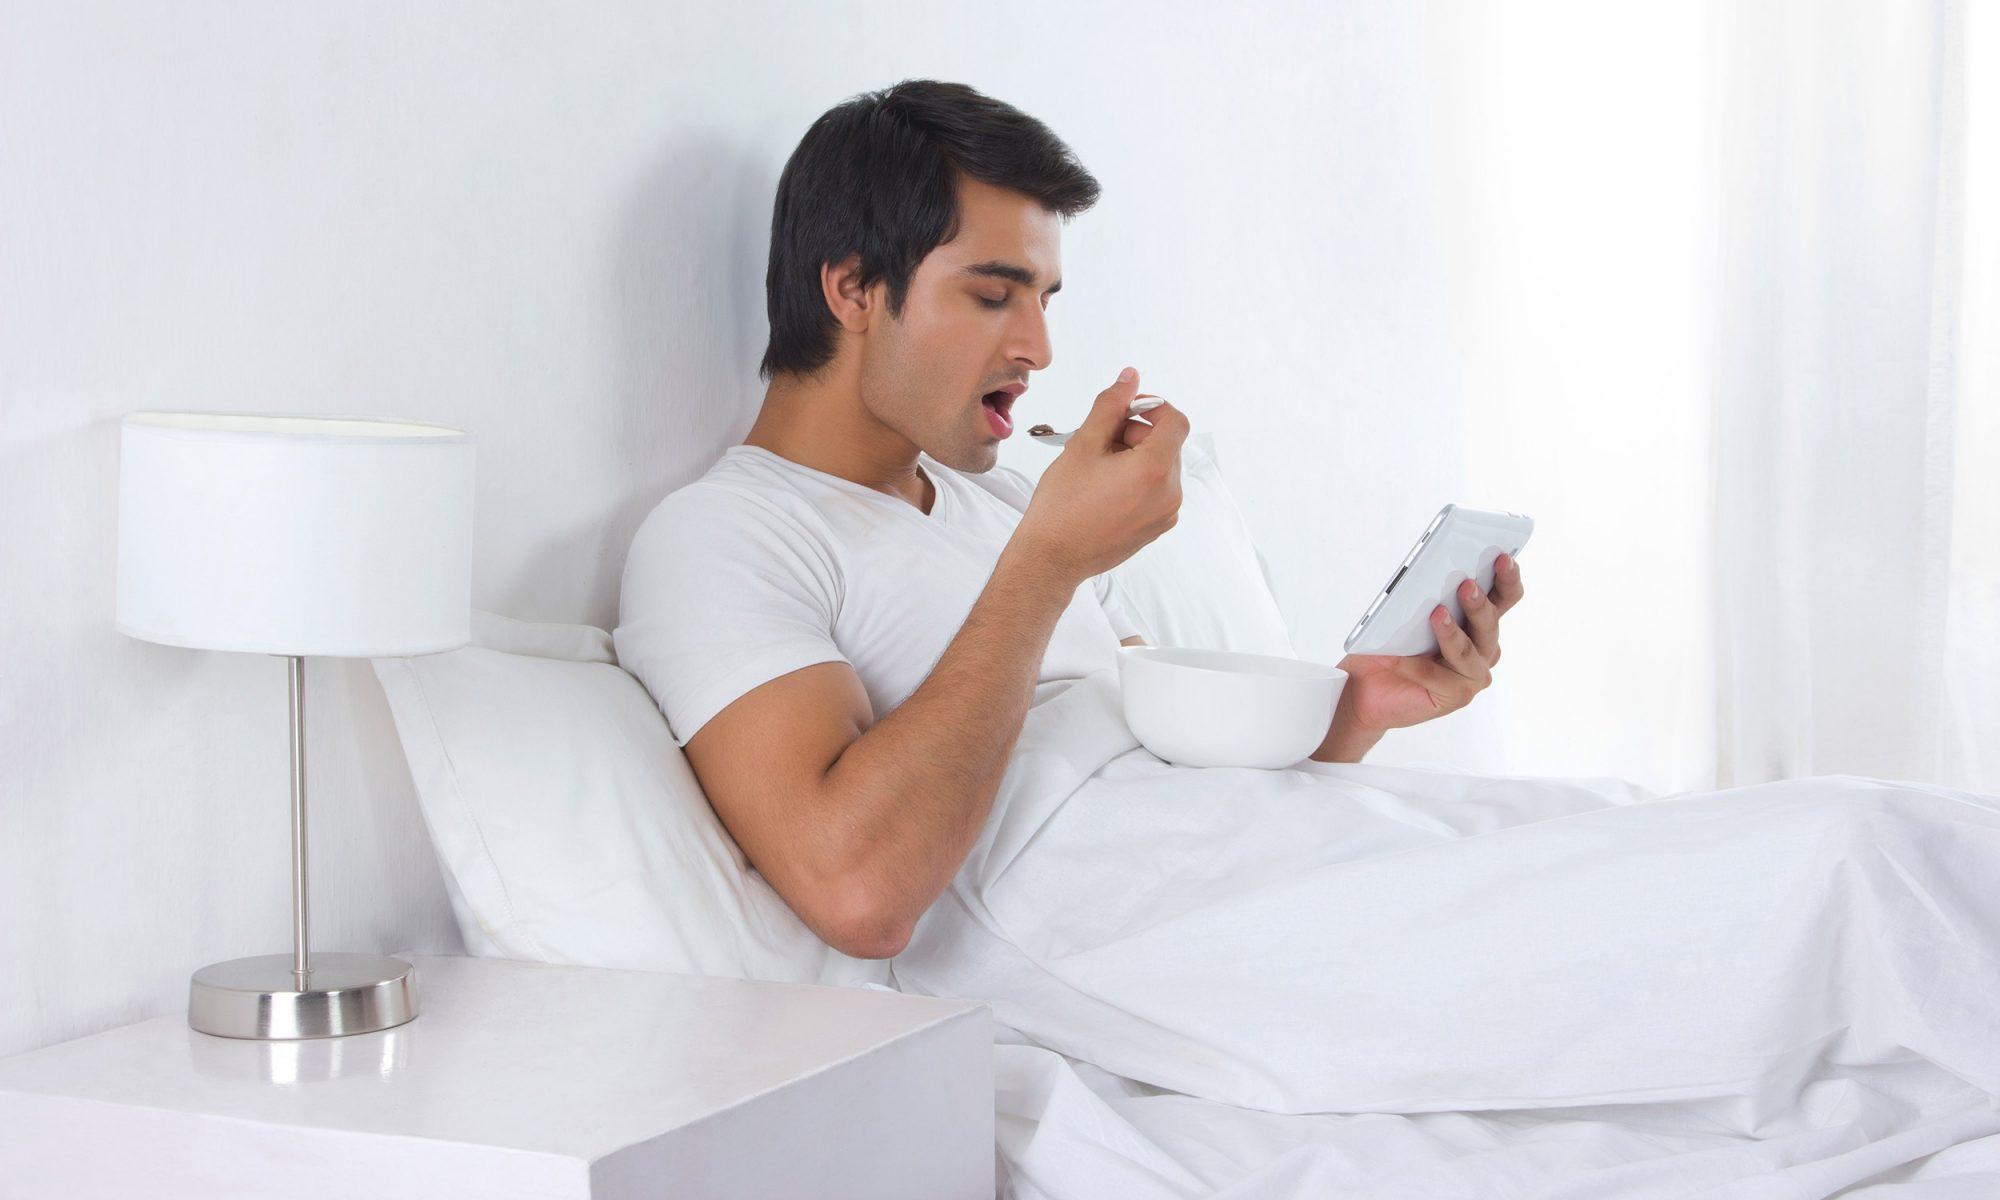 EC: Researchers Find Millennials Are Choosing Food Over Sex